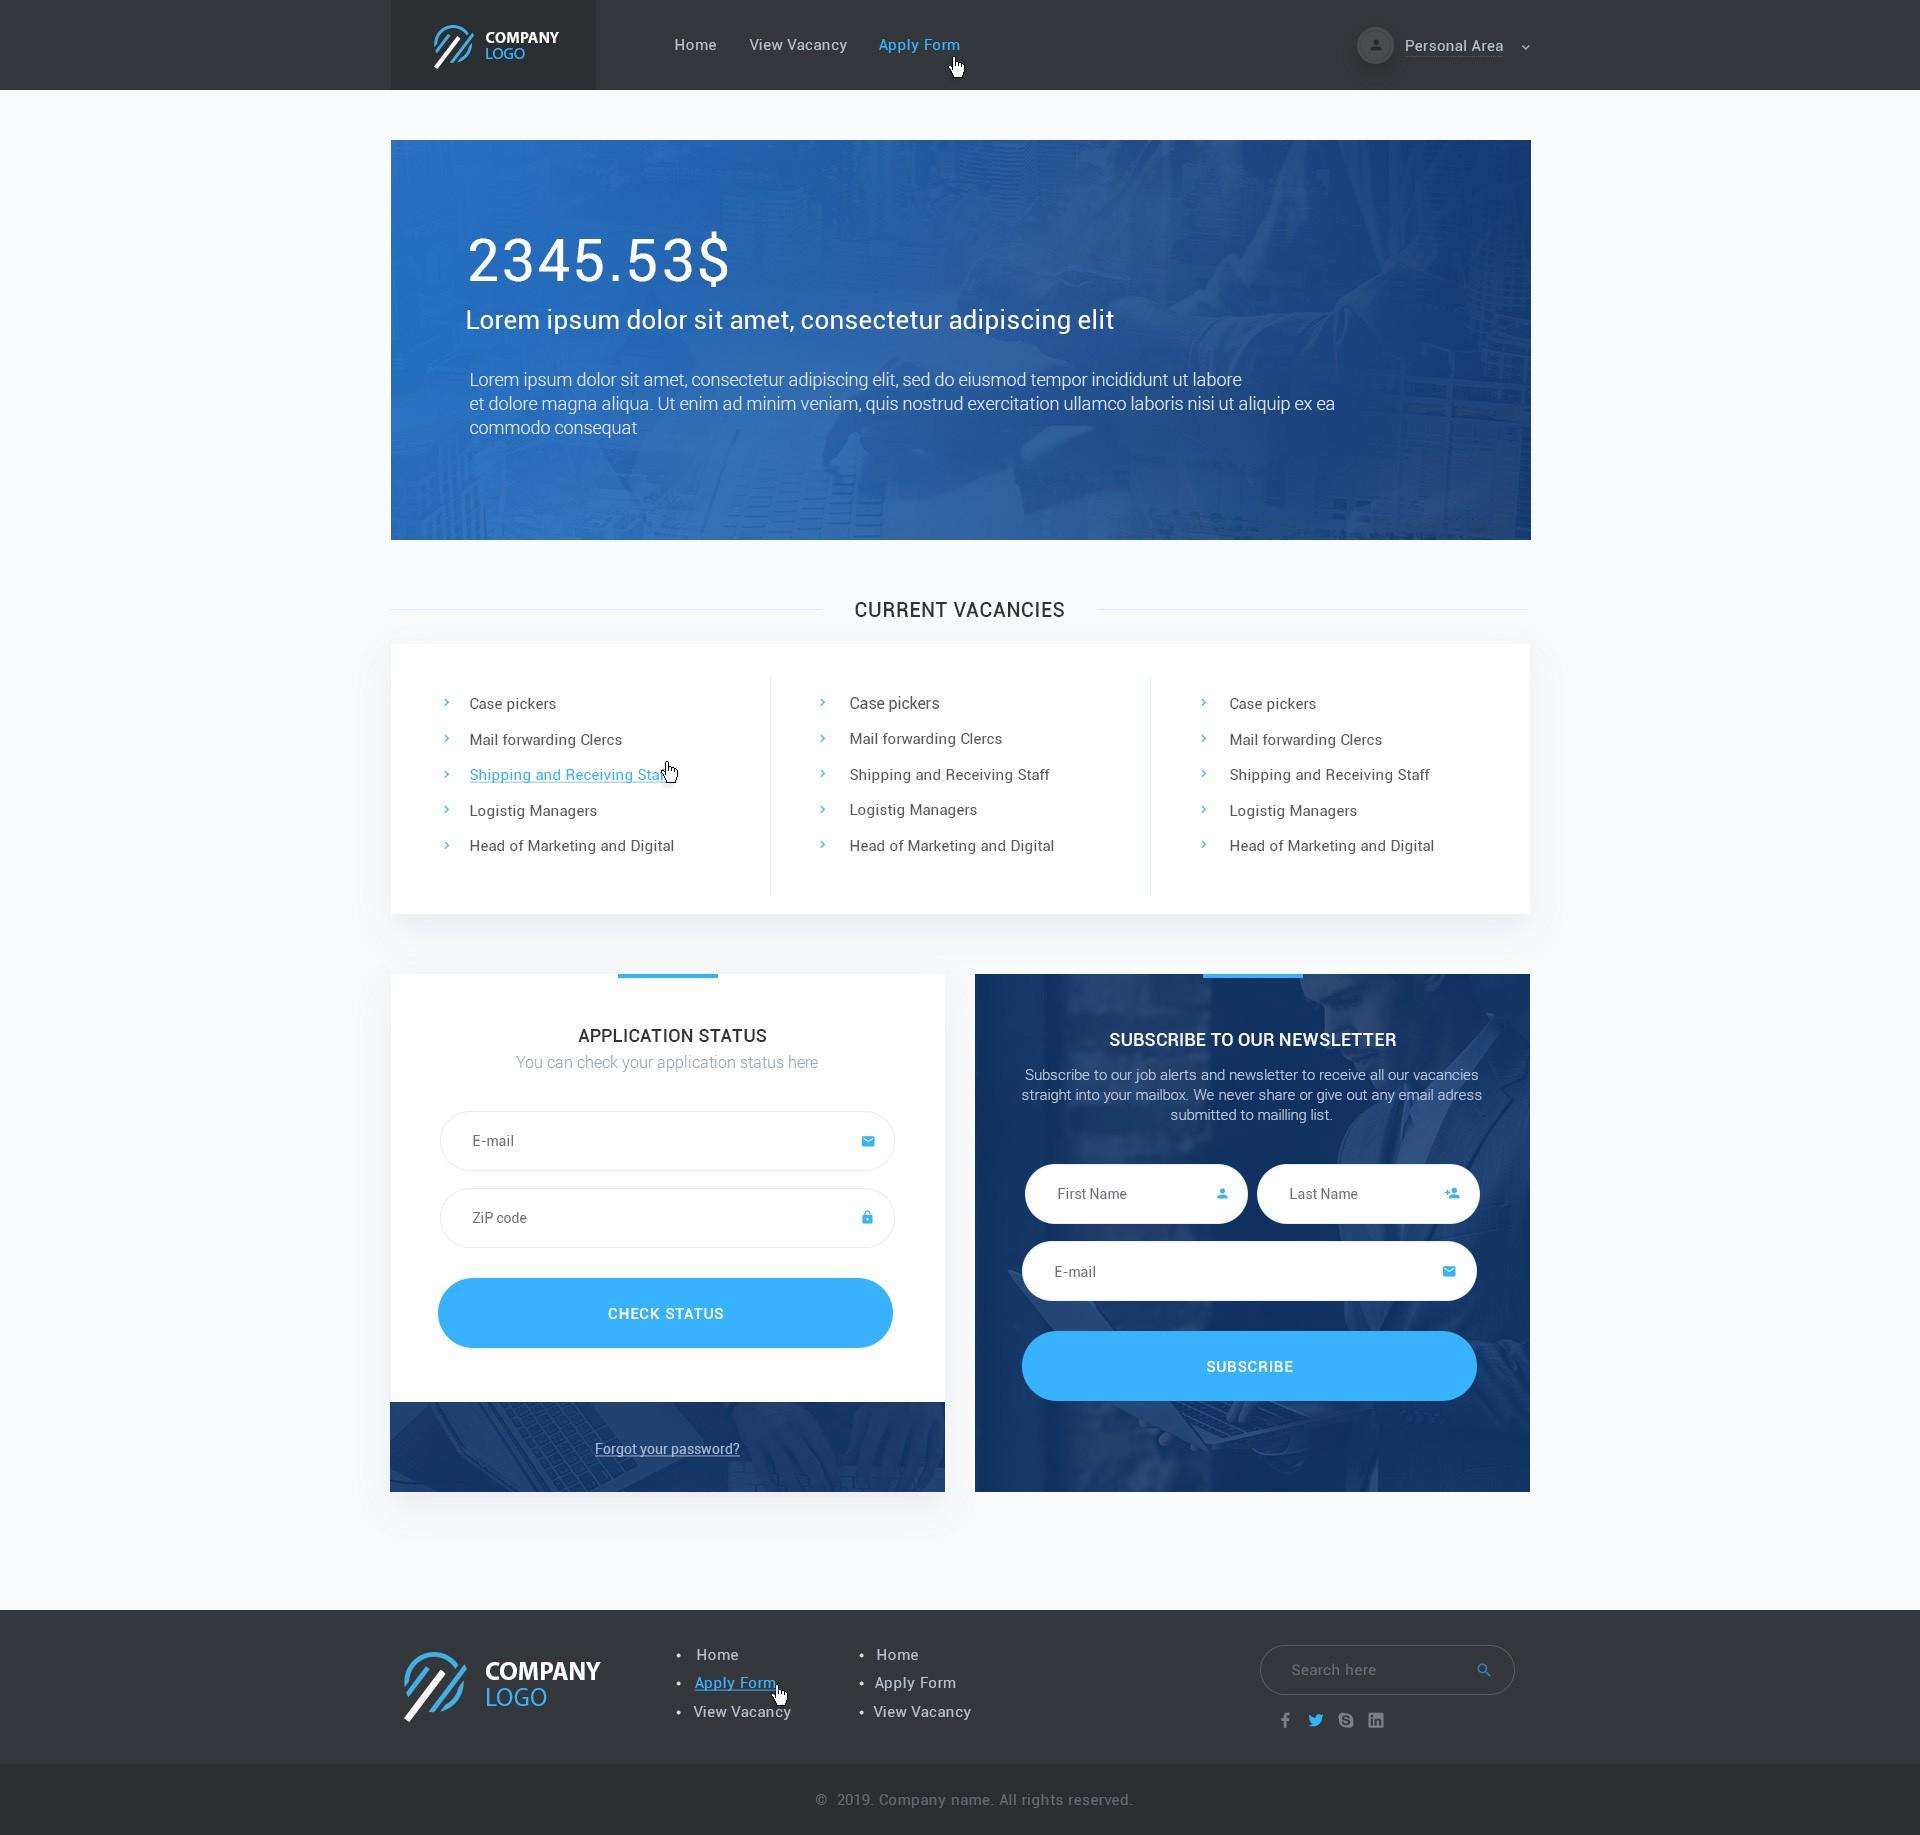 Jobs-Dashboard_01_Home_0.3